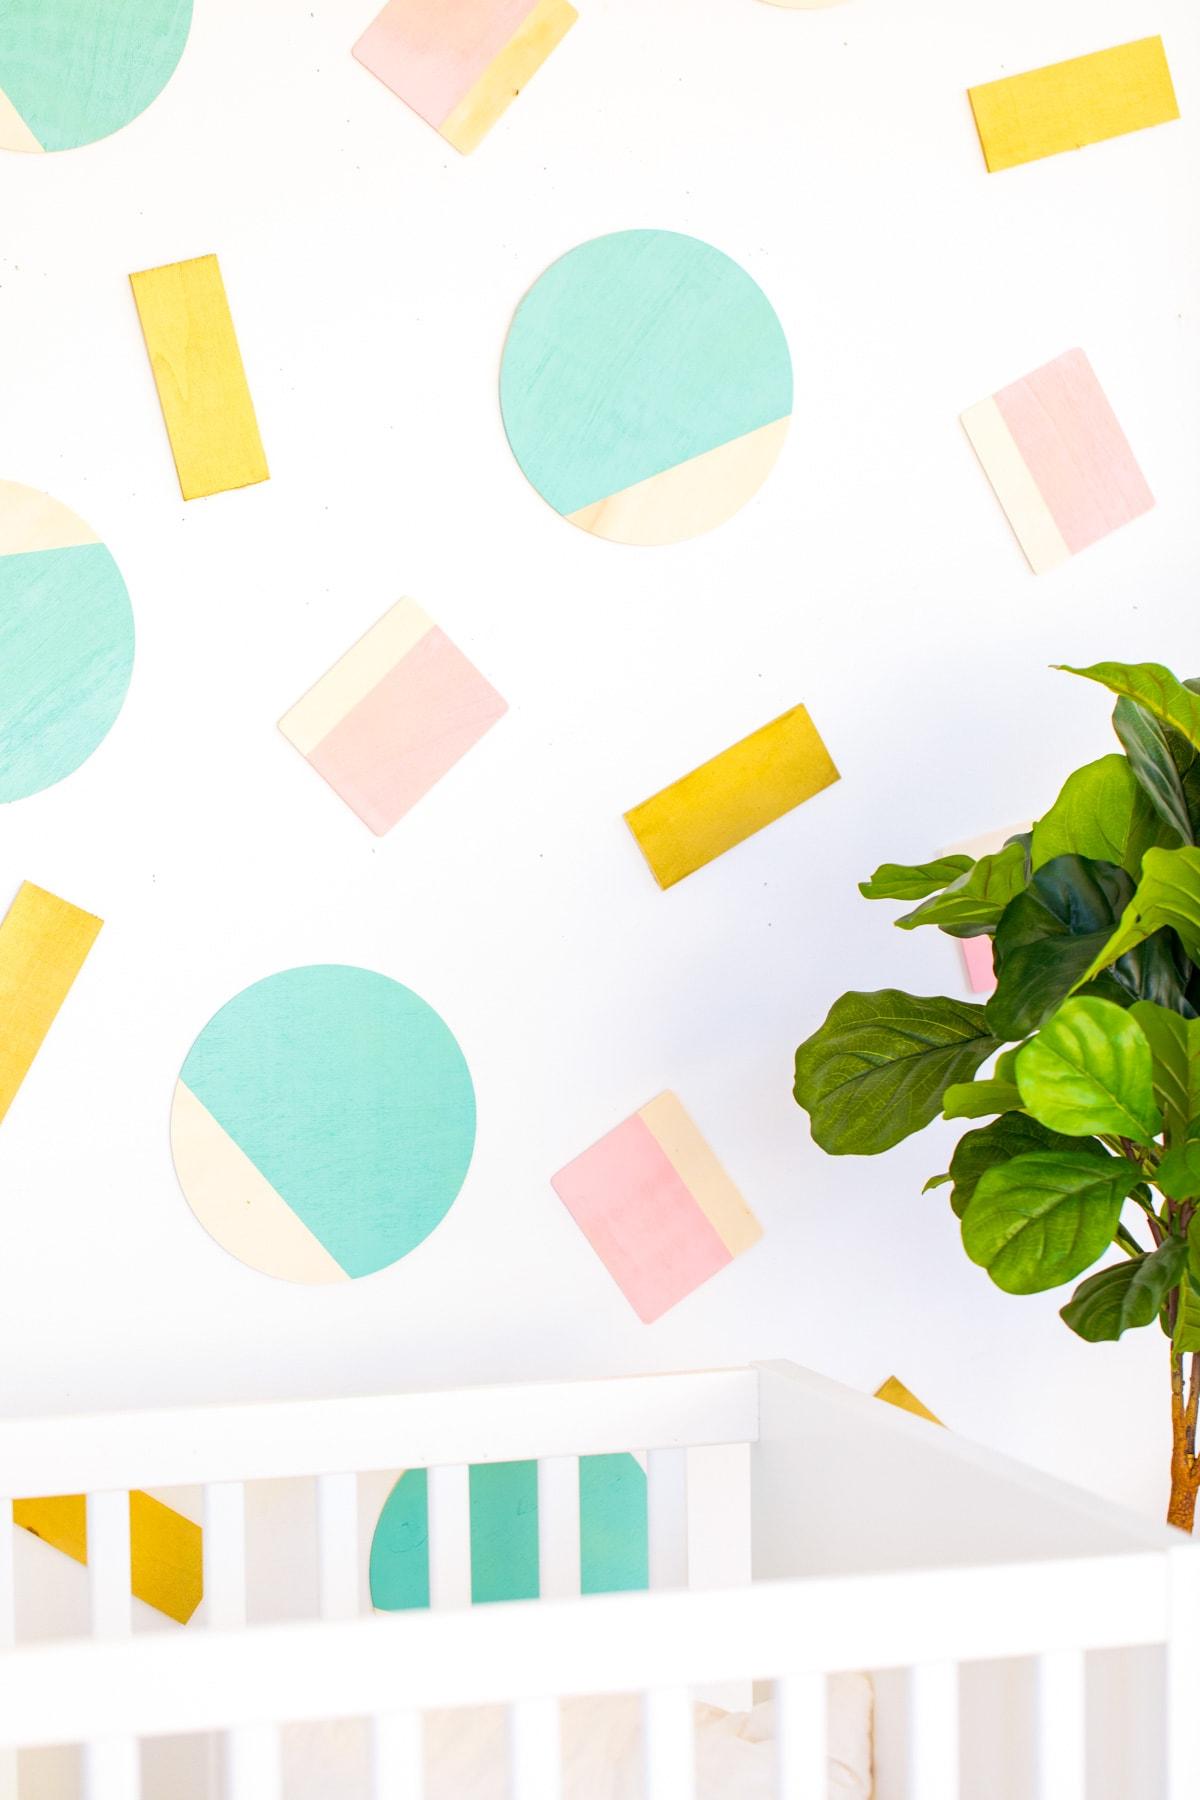 Abstract Shapes DIY Wall Decor by Houston lifestyle blogger Ashley Rose of Sugar and Cloth -- #DIYBABYROOMDECOR #KRYLON #SPRAYPAINTPROJECT #NURSERYIDEAS